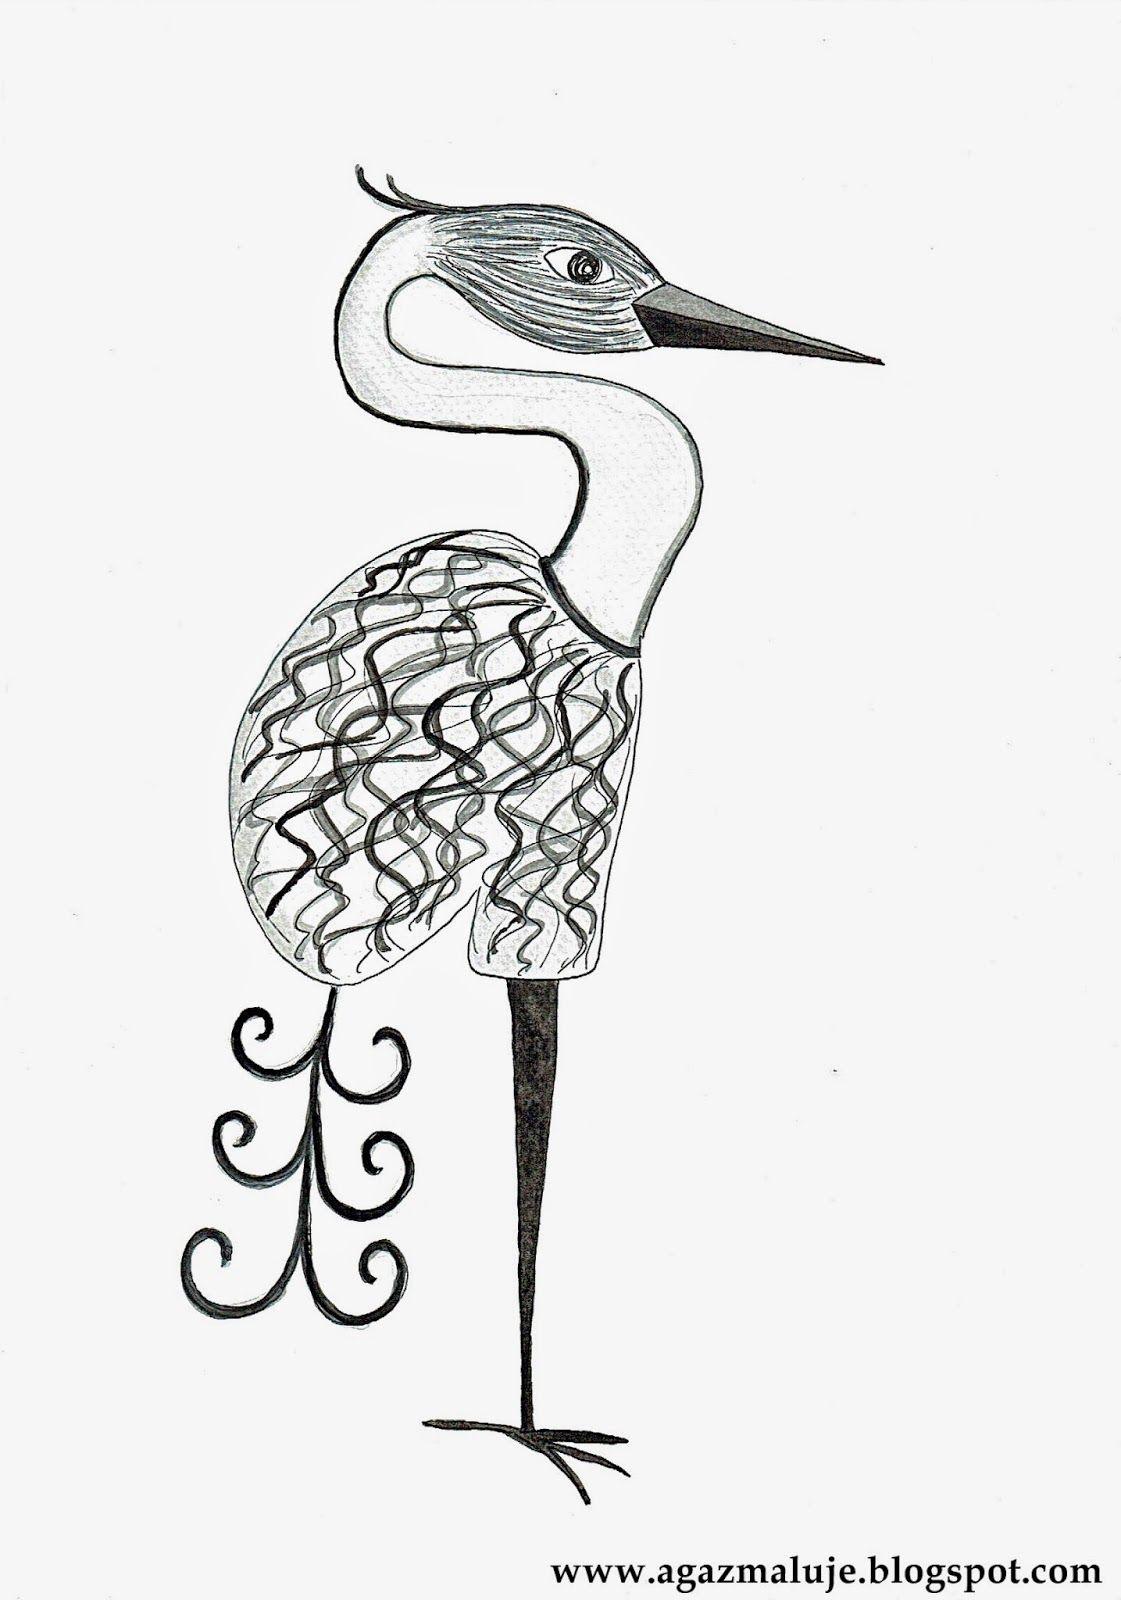 Obraz Na Sciane Czarno Bialy Ptak Akwarele Art Humanoid Sketch Photo And Video